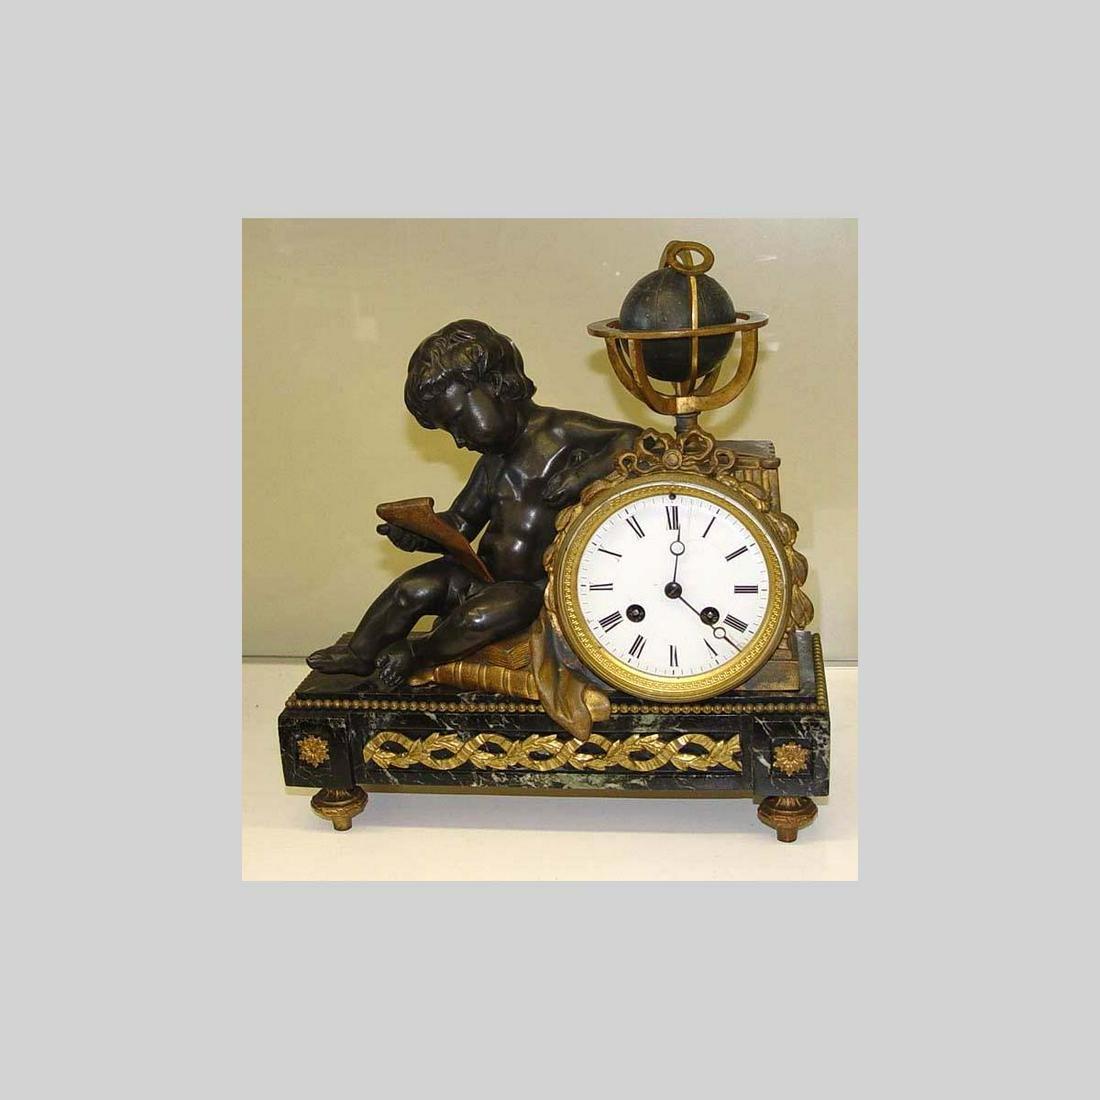 19C FRENCH GILT SPELTER CHERUB ASTRONOMER MANTLE CLOCK